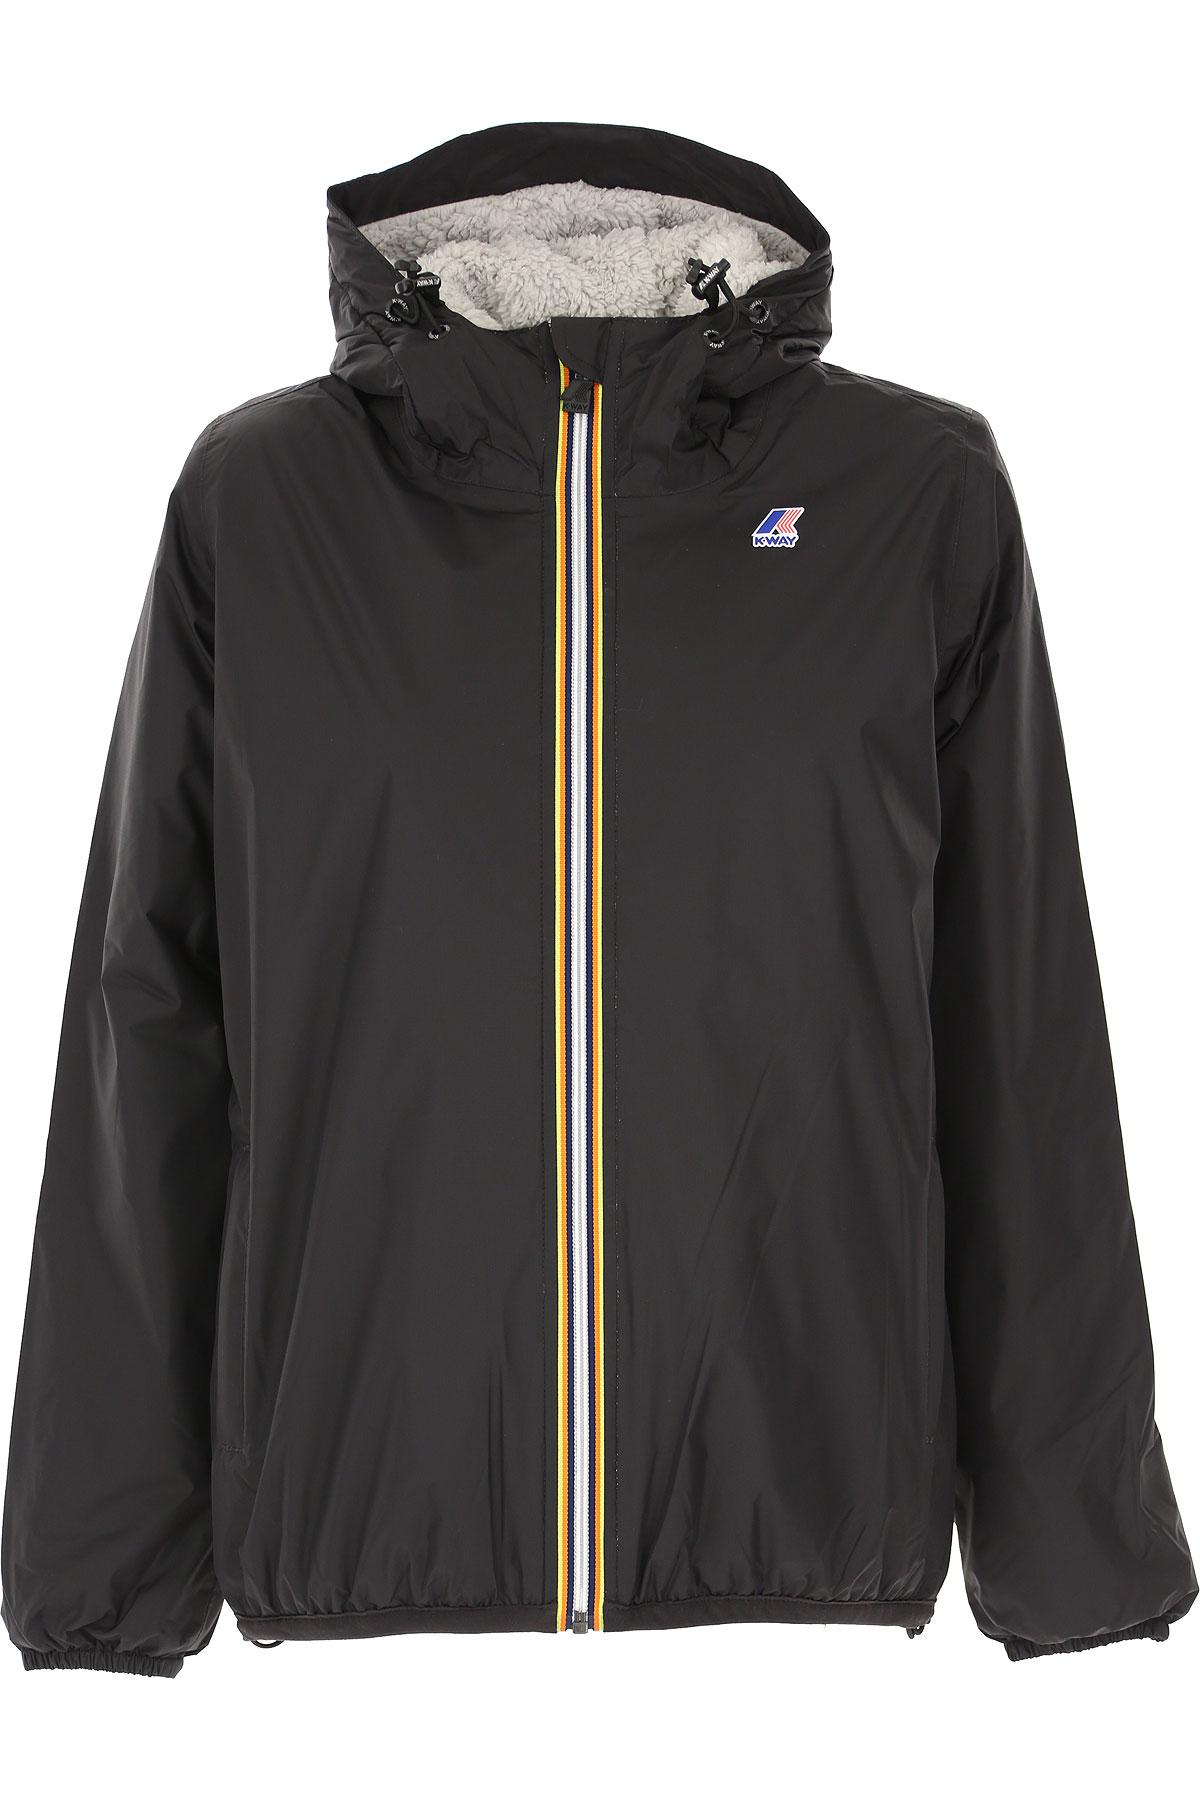 K-Way Down Jacket for Women, Puffer Ski Jacket On Sale, Black, polyamide, 2019, 44